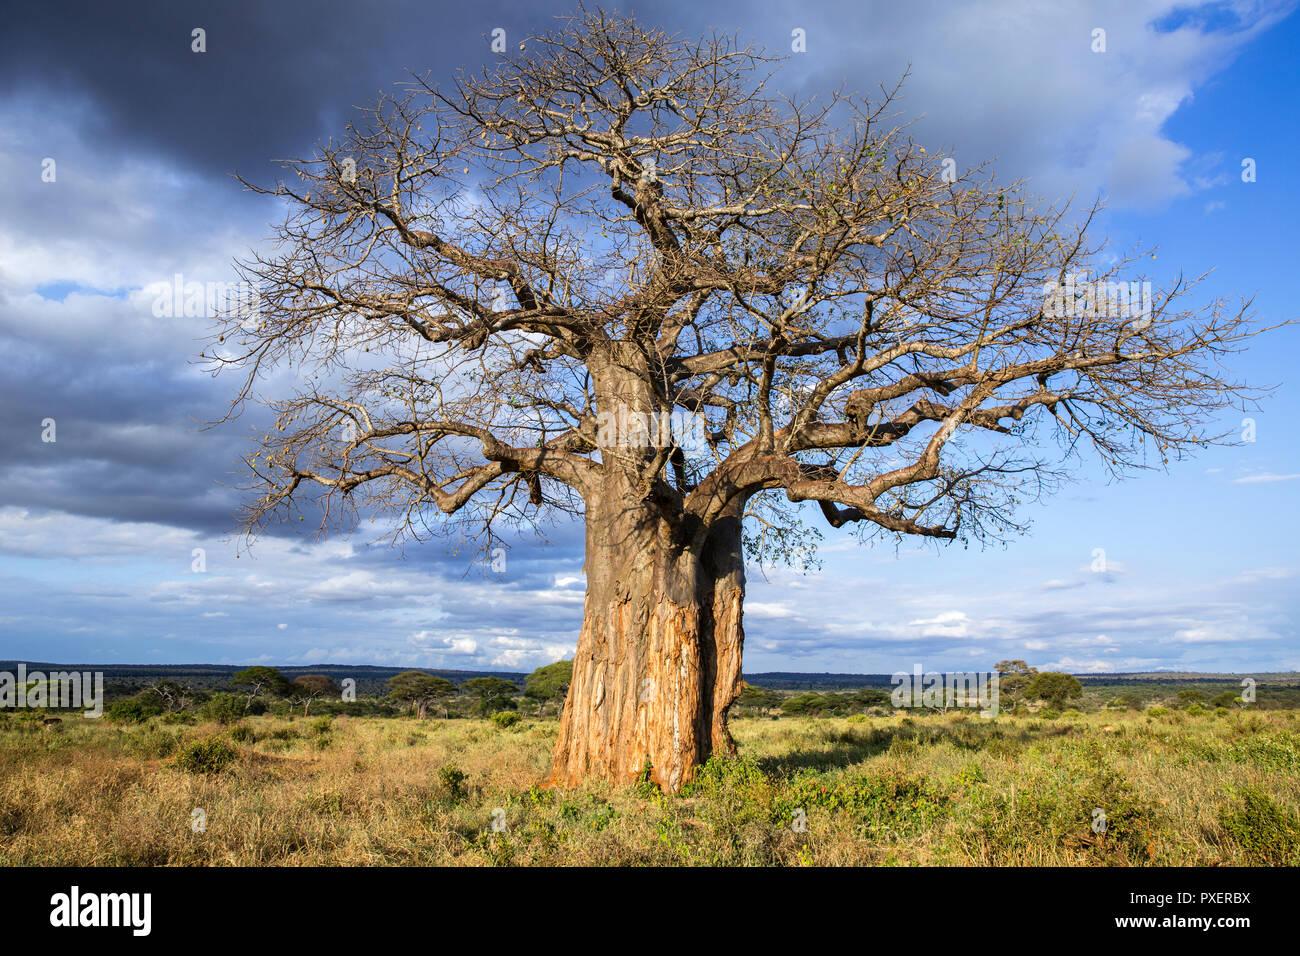 Baobob tree of Tarangire National Park, Tanzania - Stock Image